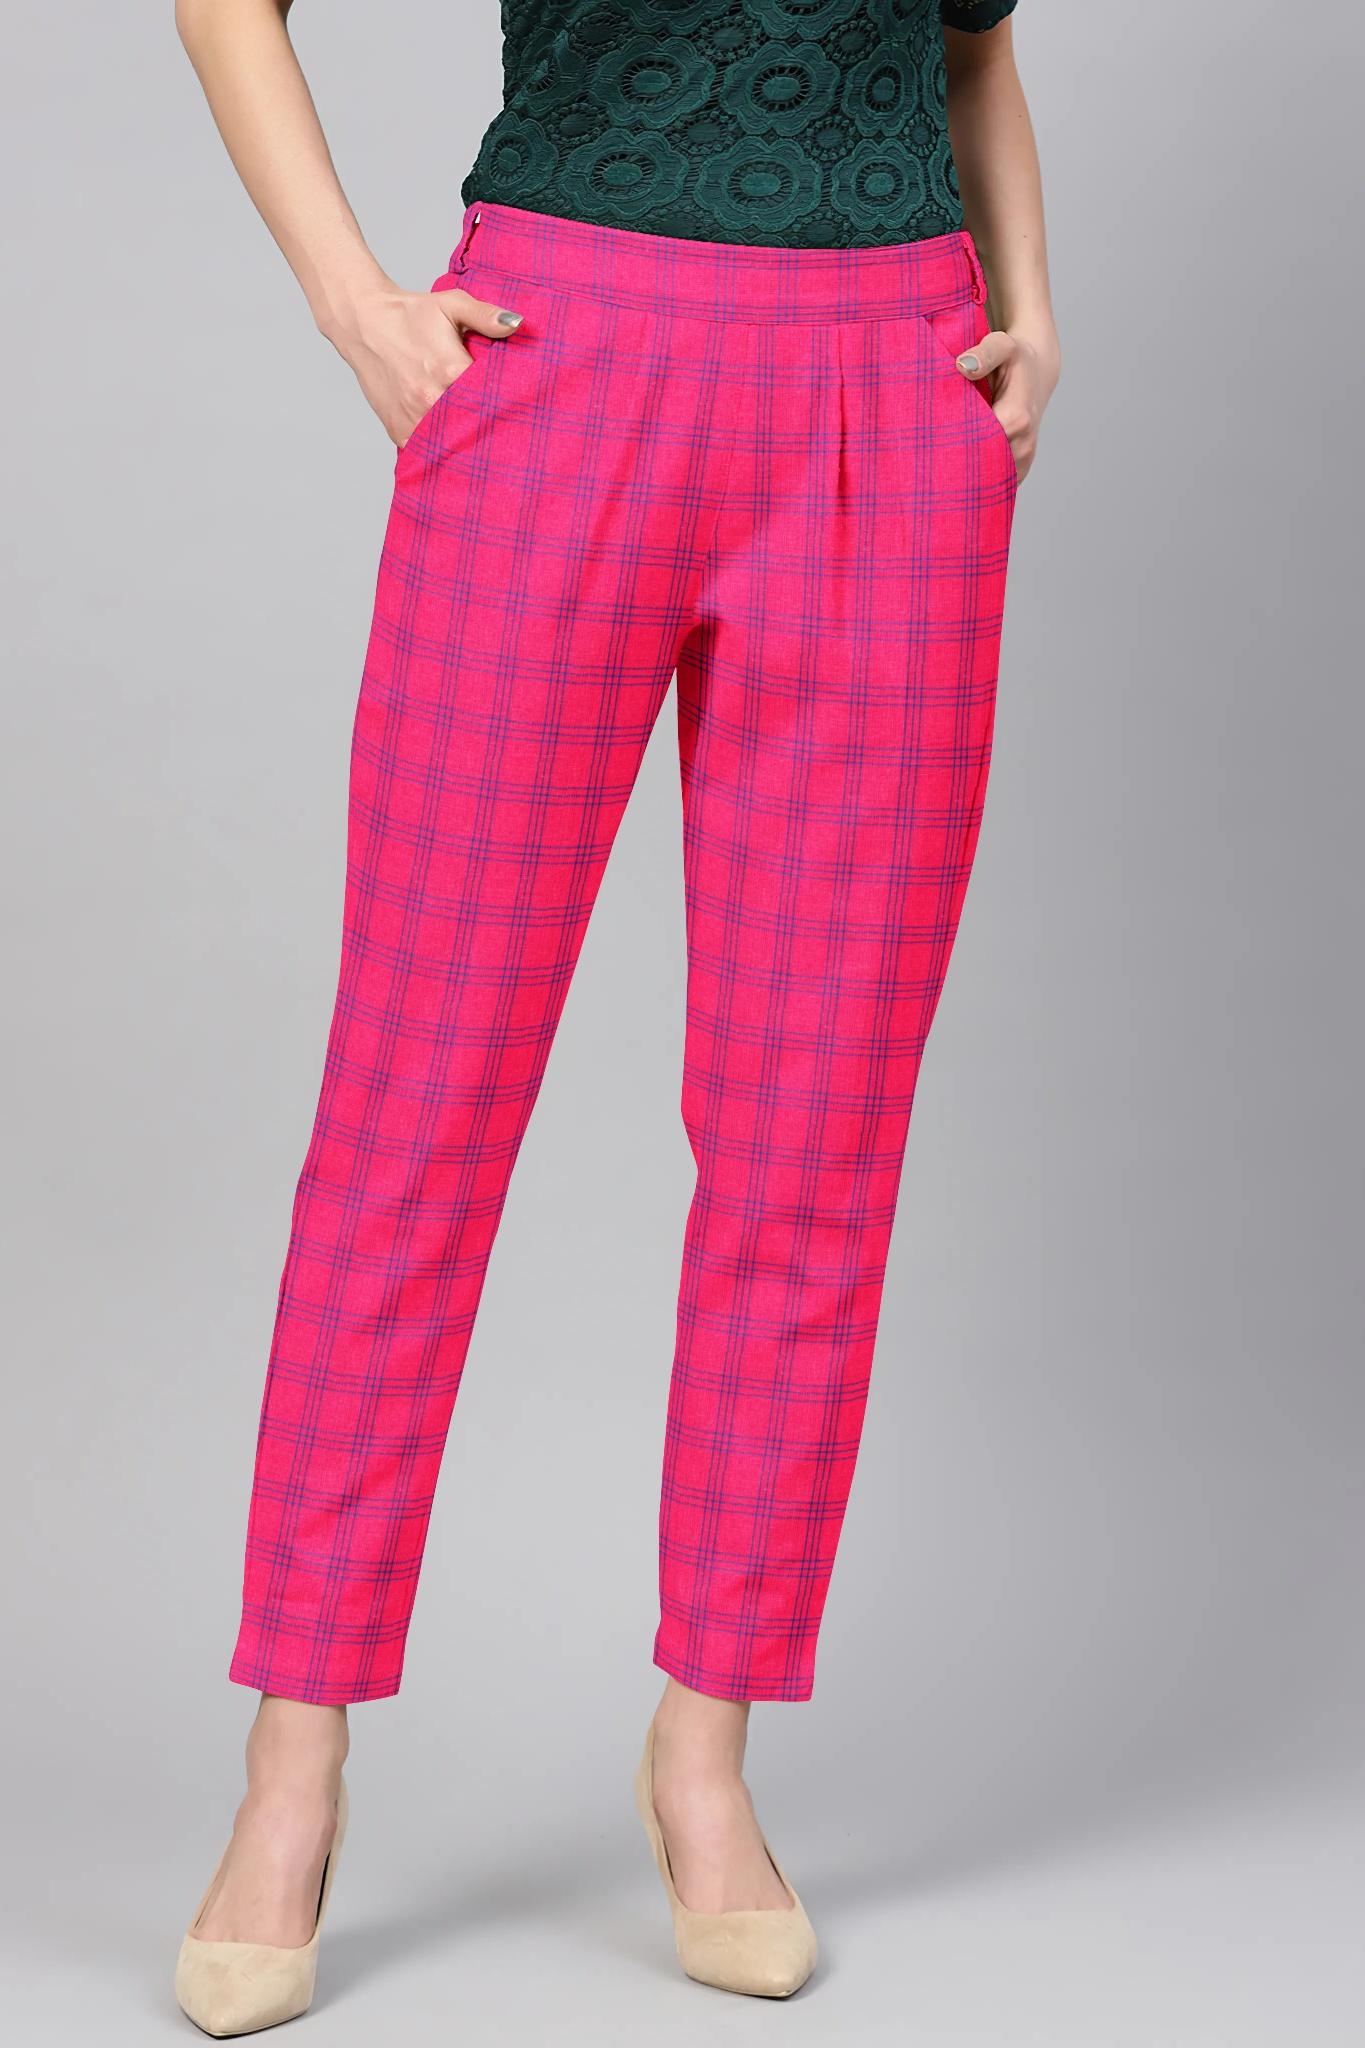 /home/customer/www/fabartcraft.com/public_html/uploadshttps://www.shopolics.com/uploads/images/medium/Pink-Blue-Cotton-Check-Regular-Fit-Solid-Trouser-36096.jpg